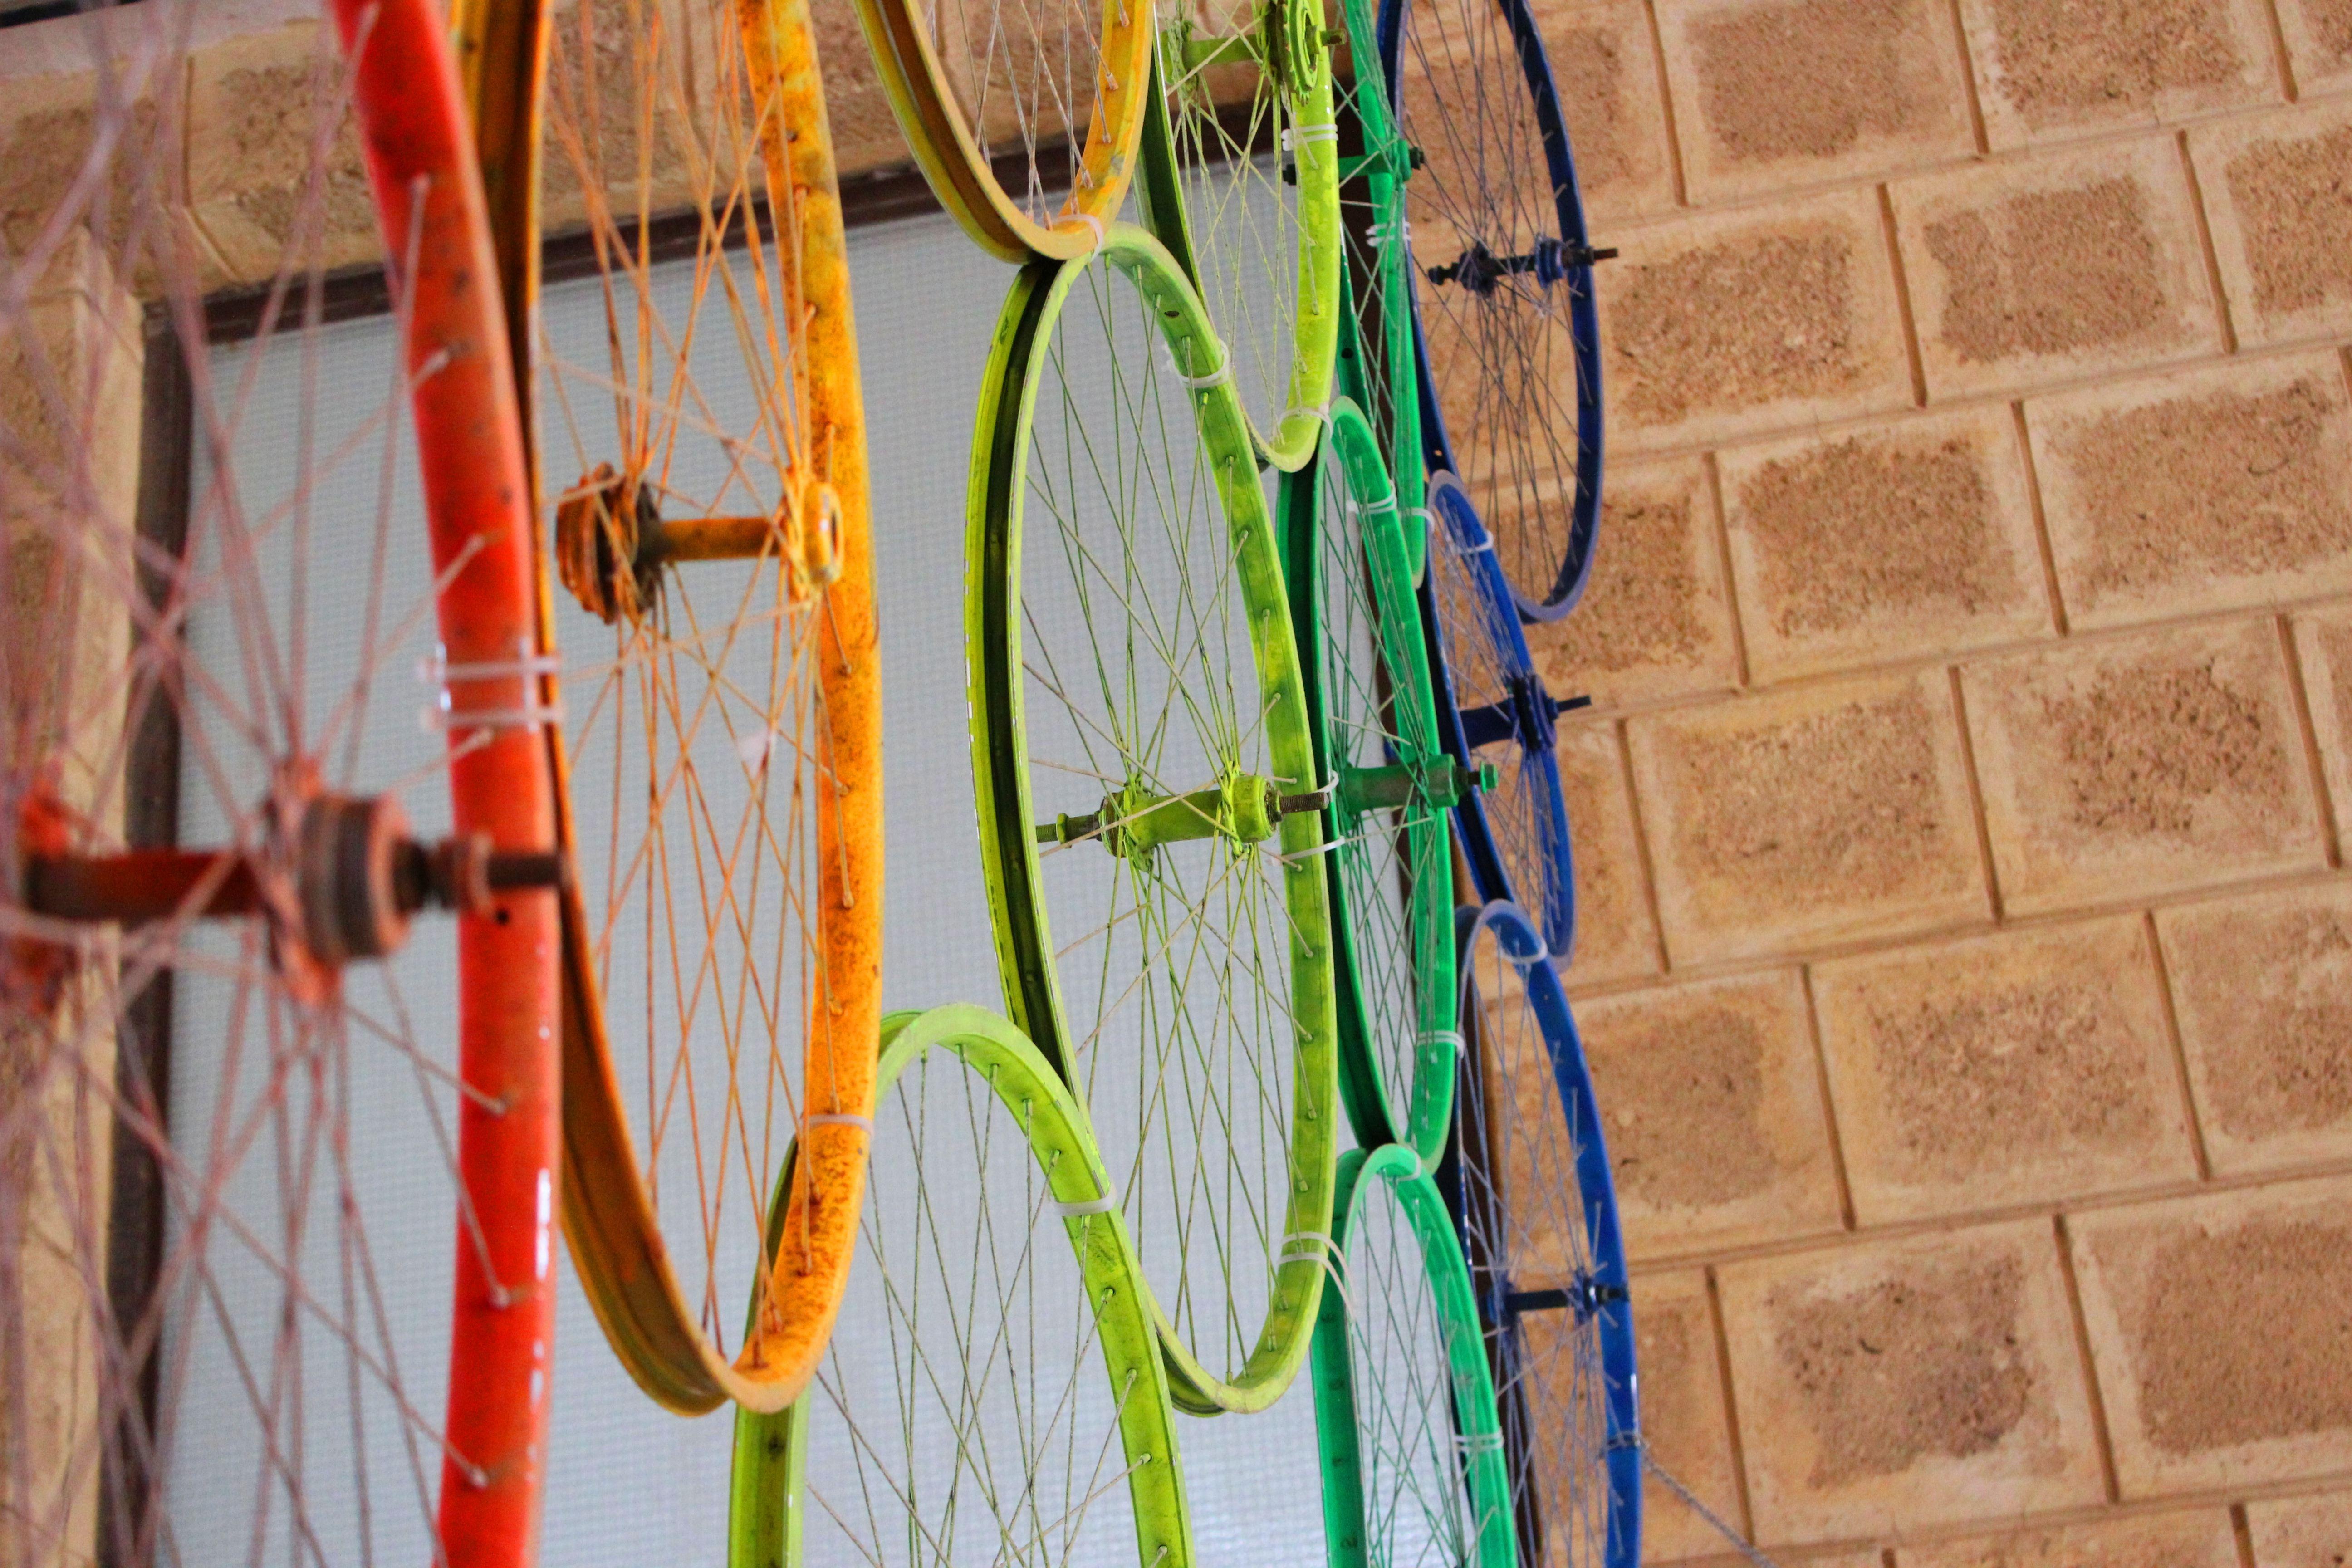 Kostenlose foto : Jahrgang, Fahrrad, Mauer, Grün, rot, Farbe ...